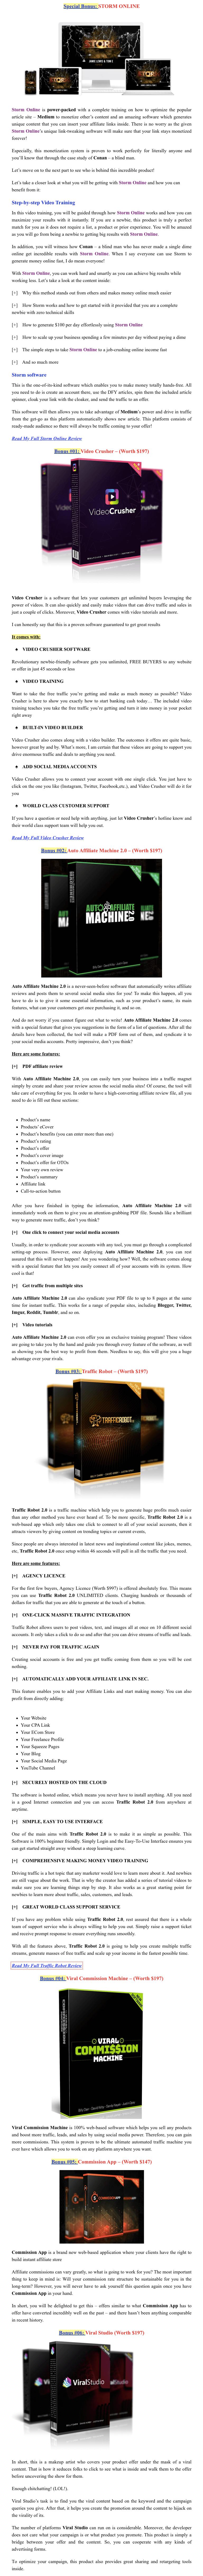 InstCommissions-Review-Bonuses